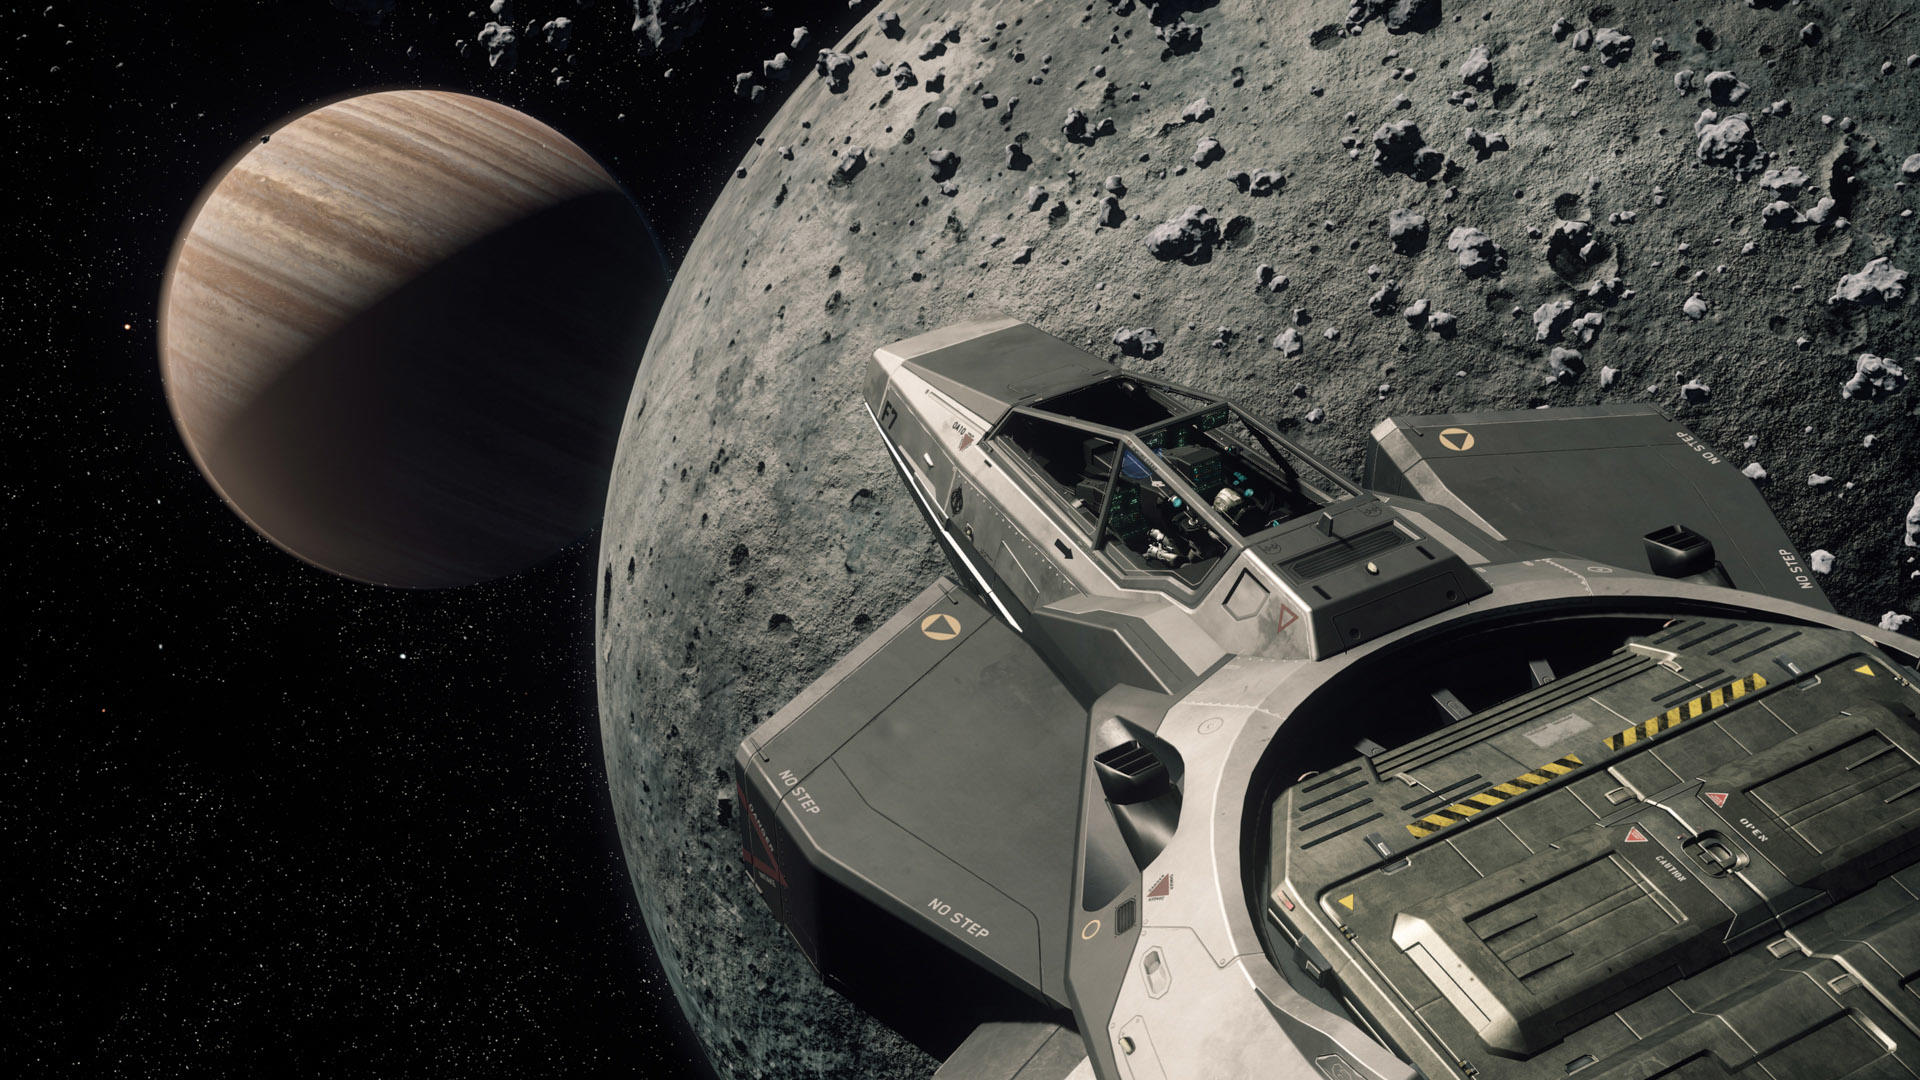 Anvil F7C Hornet nad księżycem Yela z planetą Crusader w tle